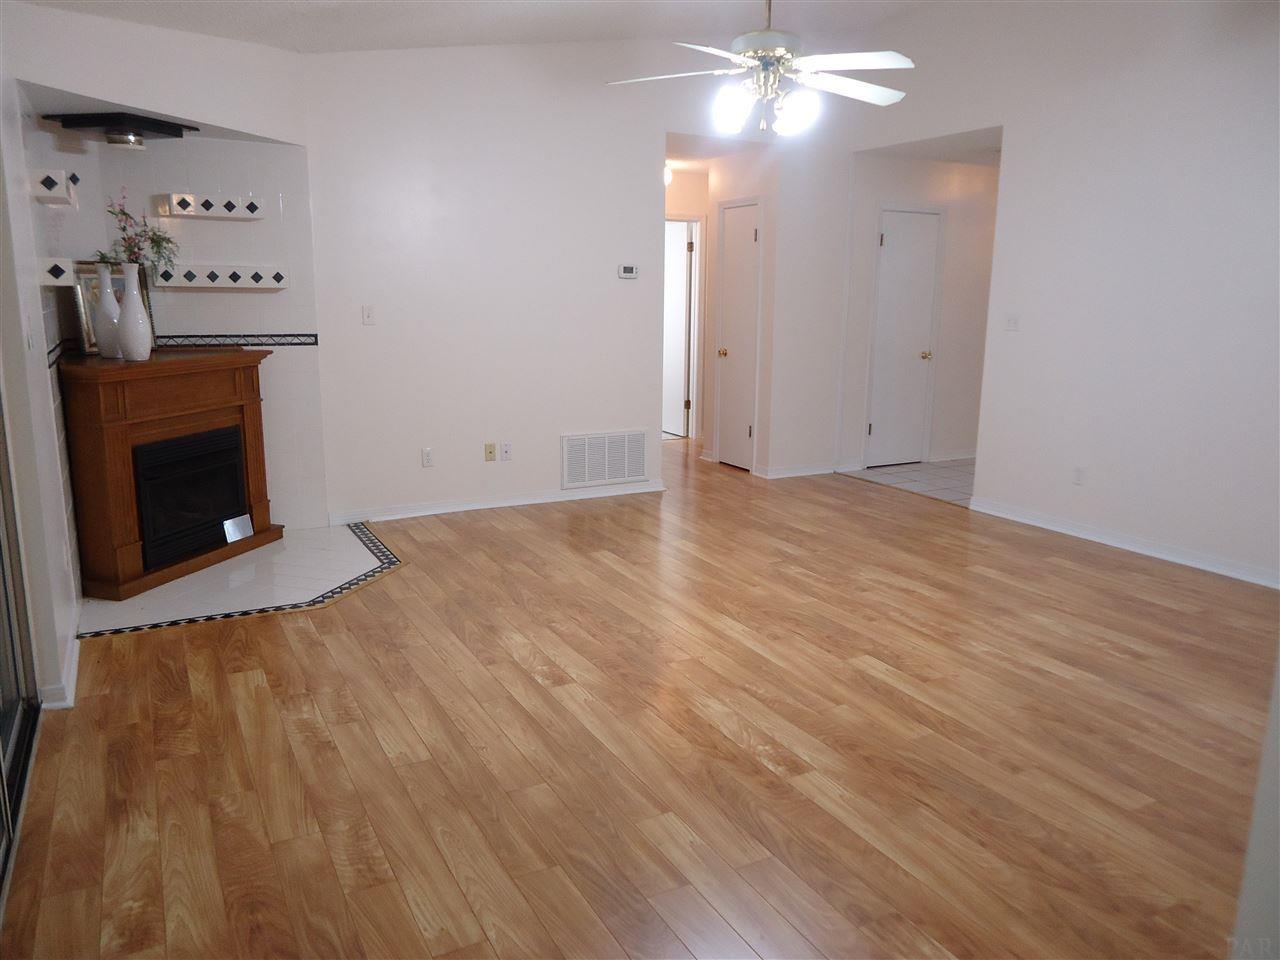 4009 Deerwood Cir, Pace, FL 32571